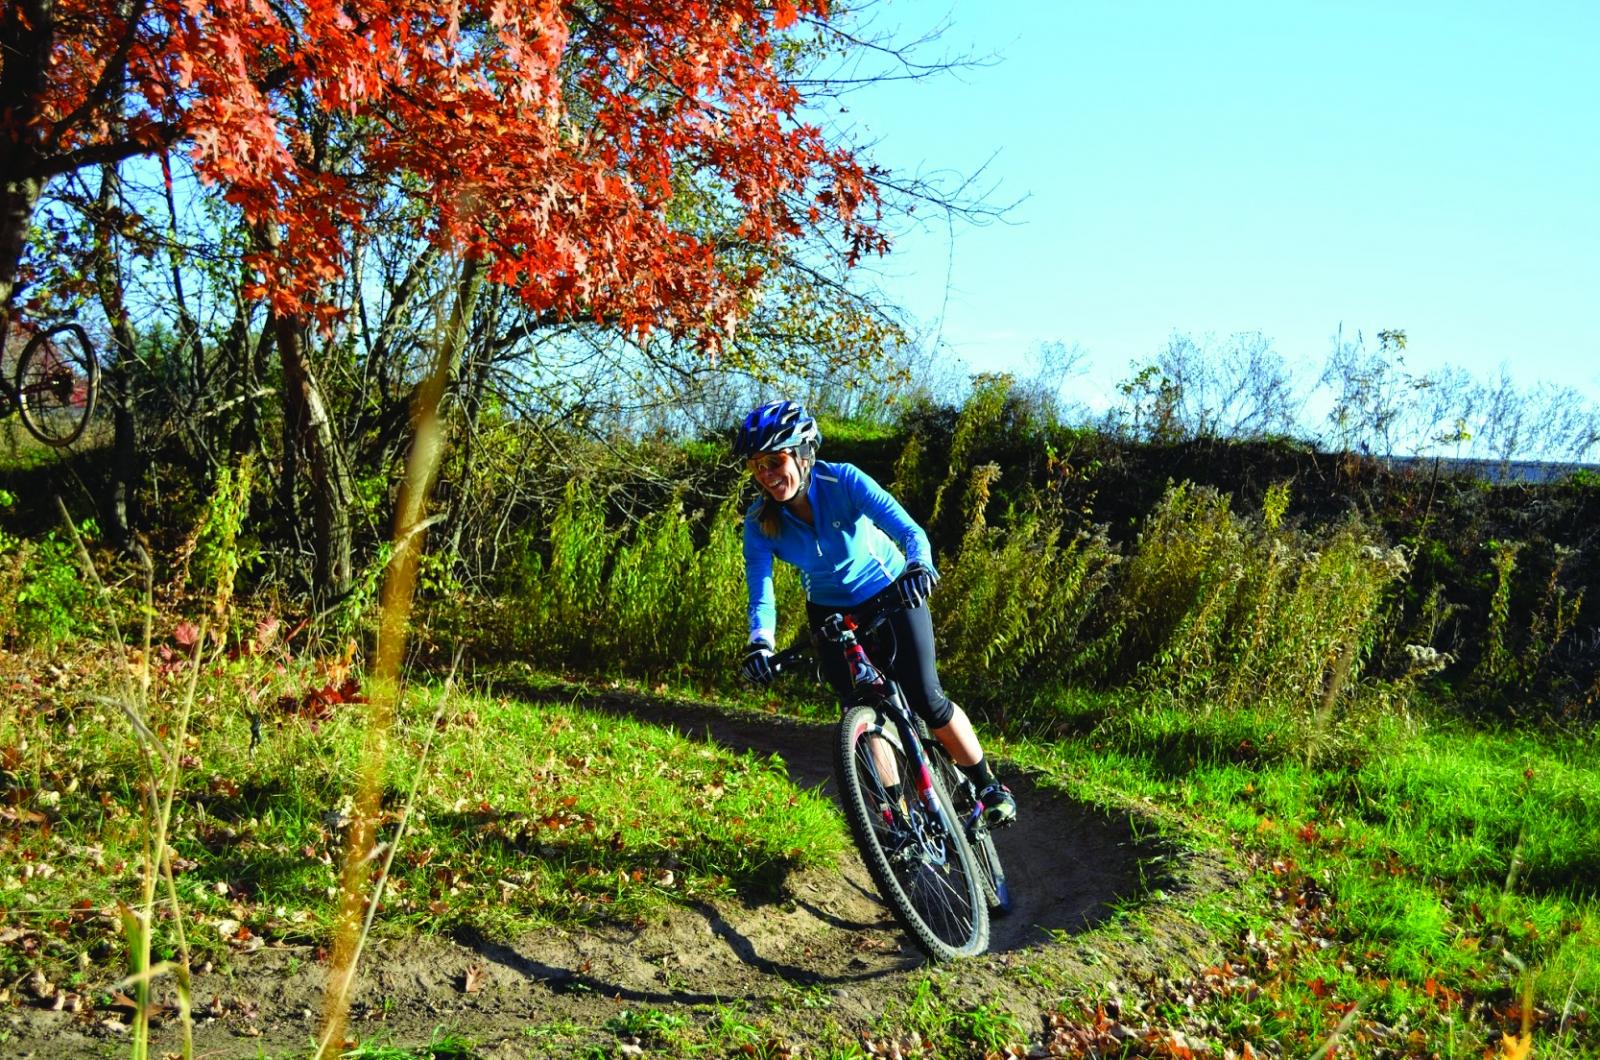 st. croix river valley, biking, autumn travel, minnesota travel